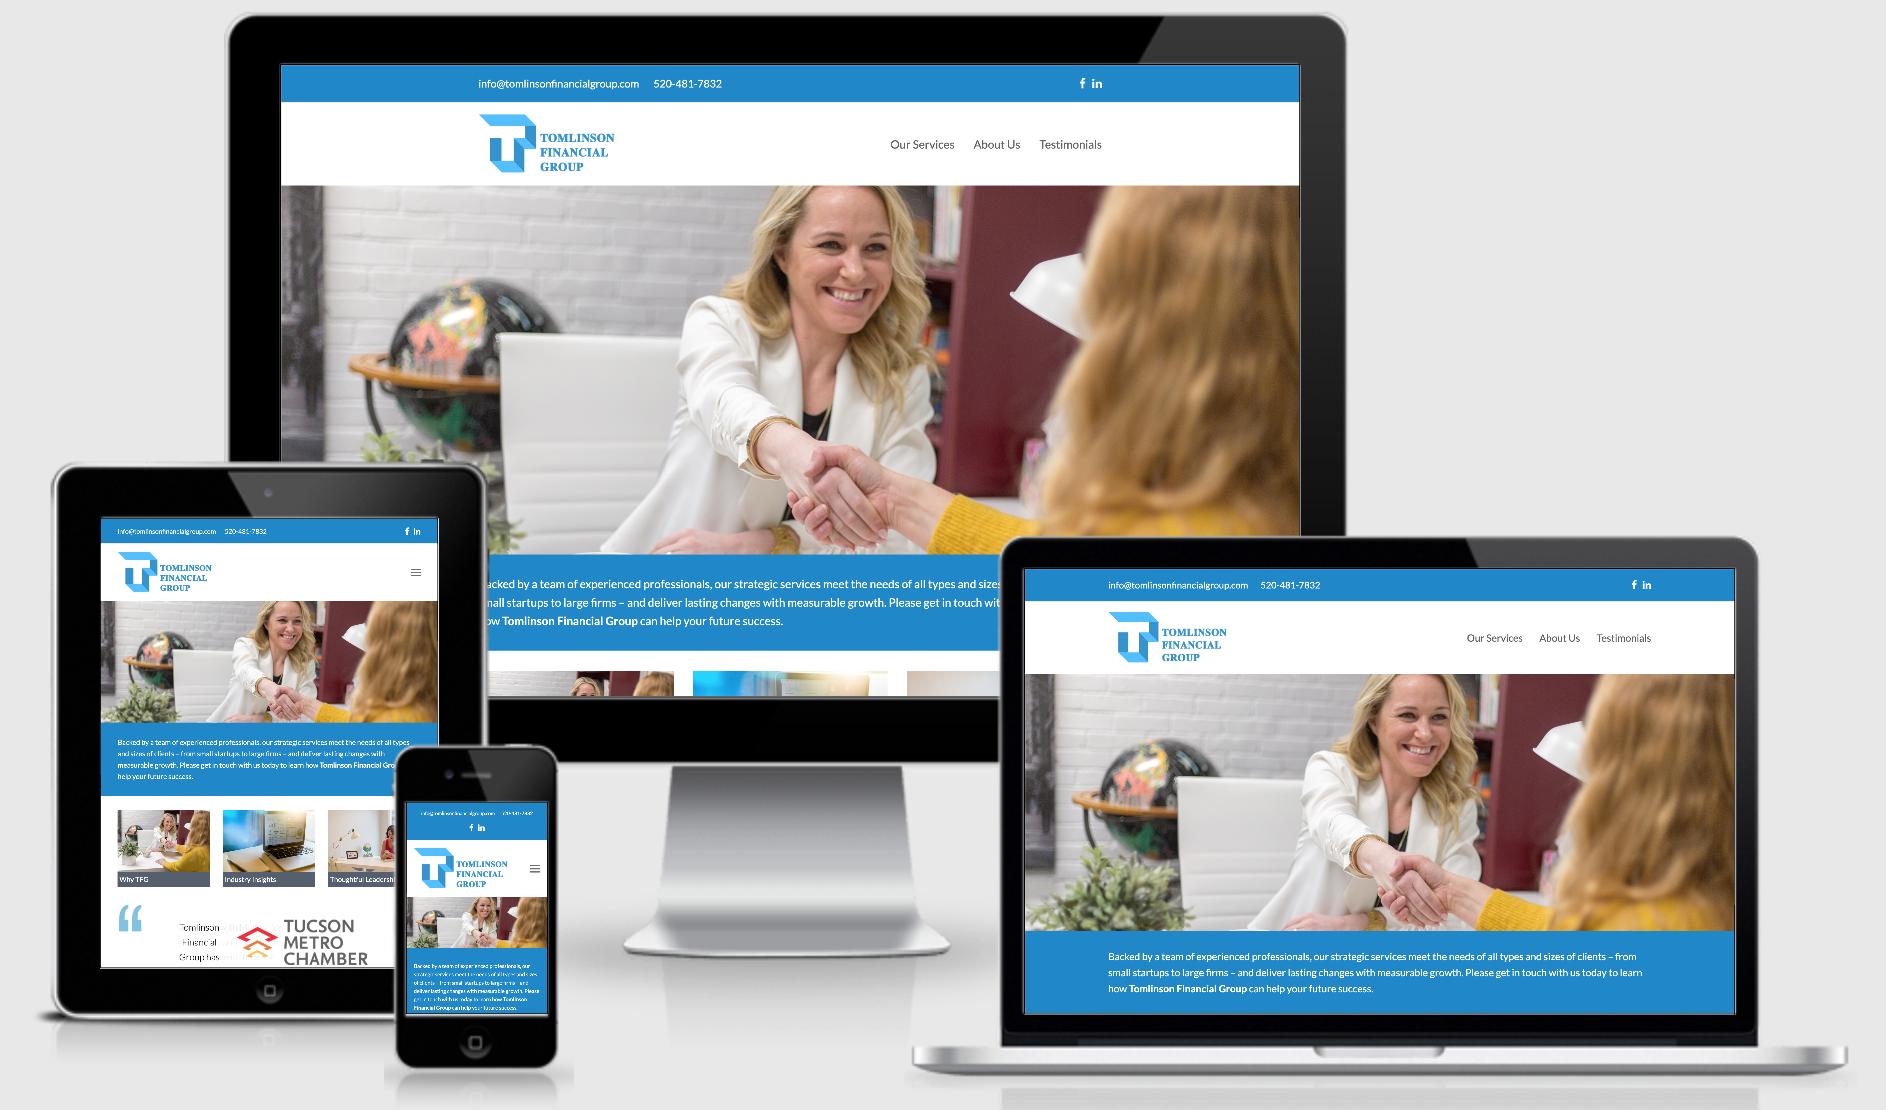 Tomlinson Financial Group Website design example